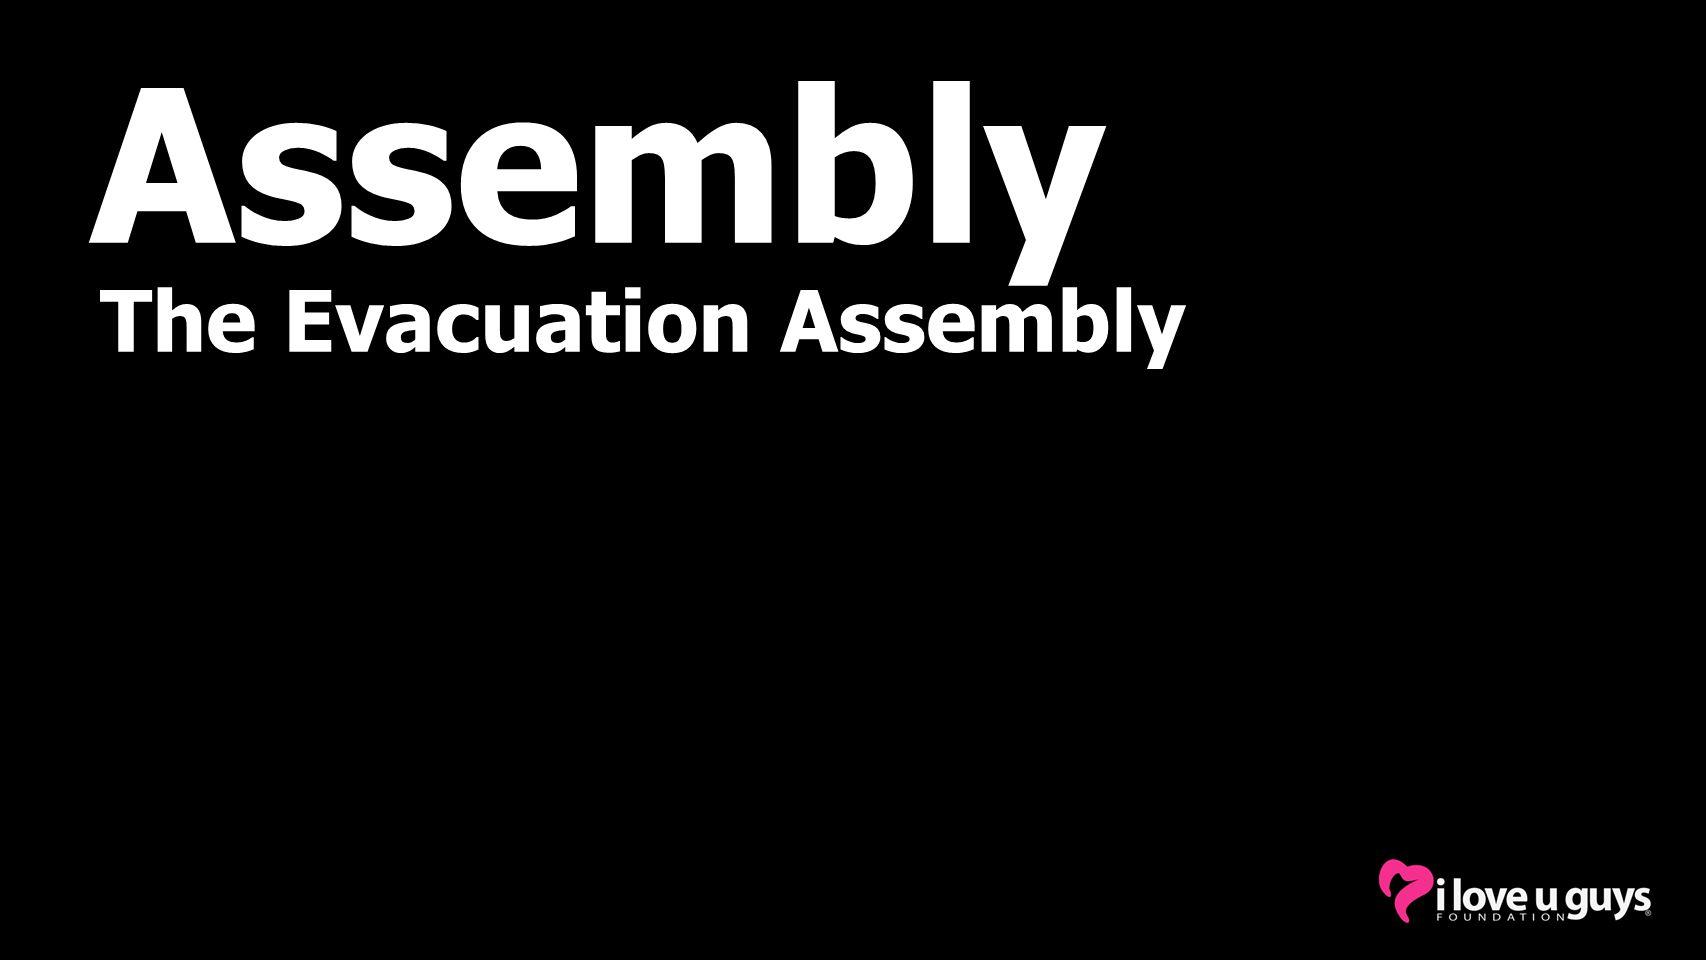 Assembly The Evacuation Assembly